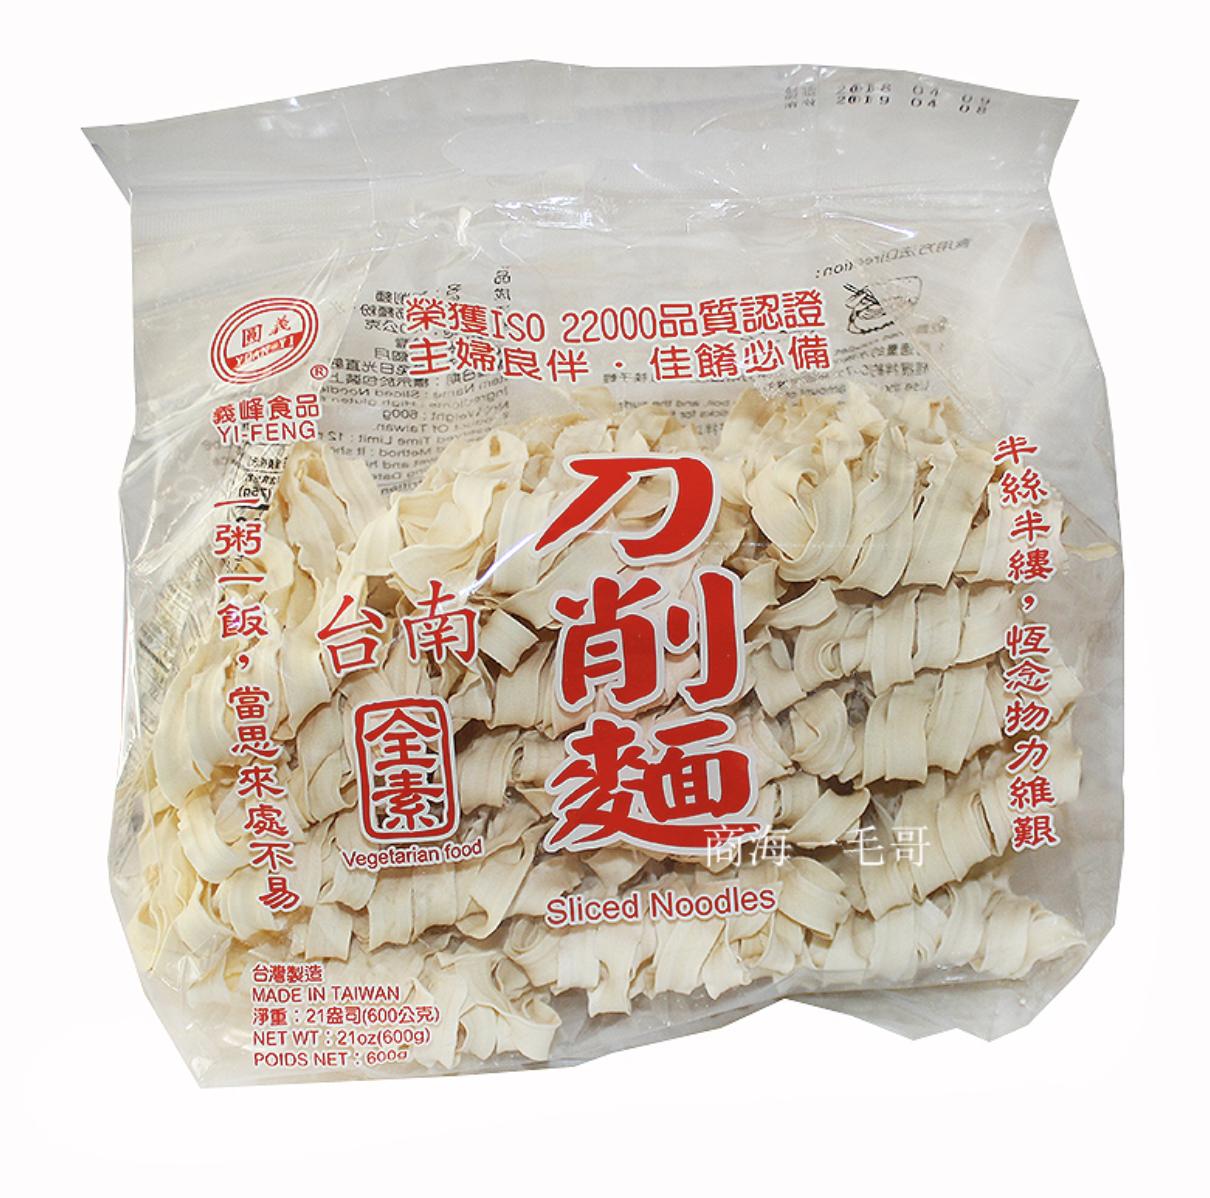 园义 台南刀削面 全素 ~600g(21oz) Vegetarian food Sliced Noodles 600g